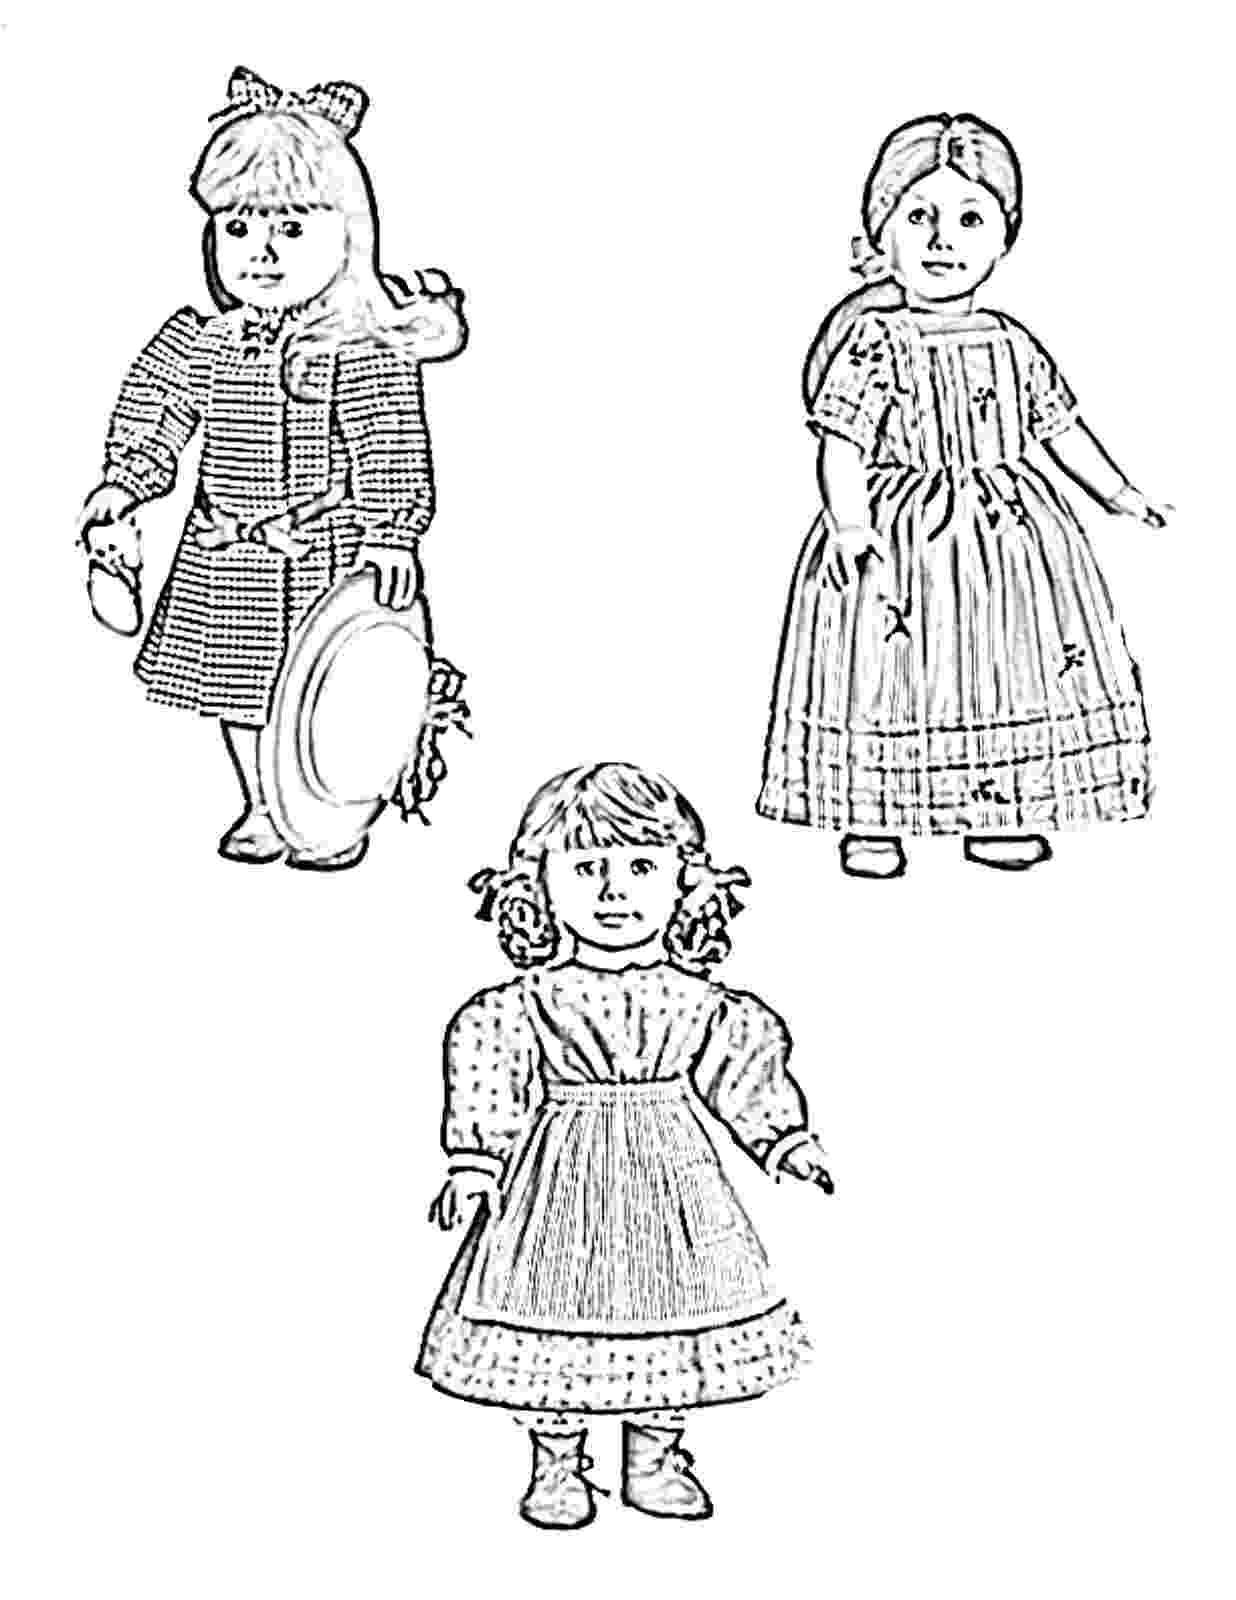 free printable american girl doll coloring pages american girl doll coloring pages printable activity shelter printable free doll coloring pages american girl